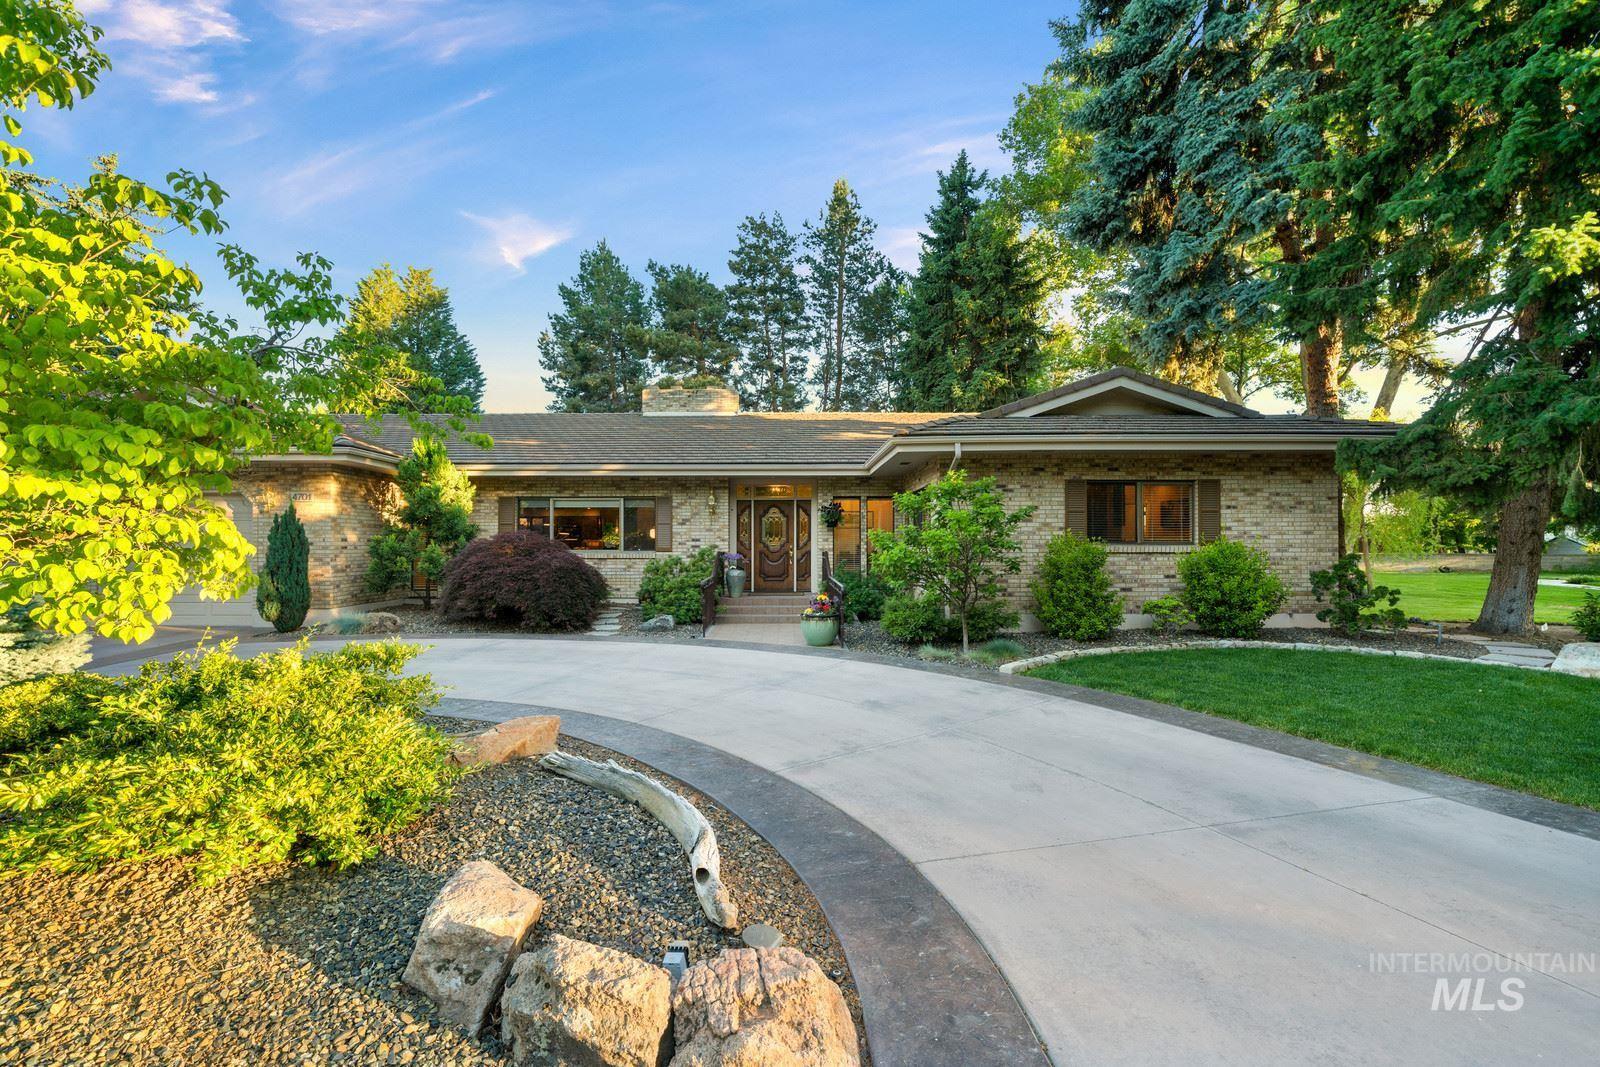 4701 W Hillcrest View Dr, Boise, ID 83705 - MLS#: 98768023